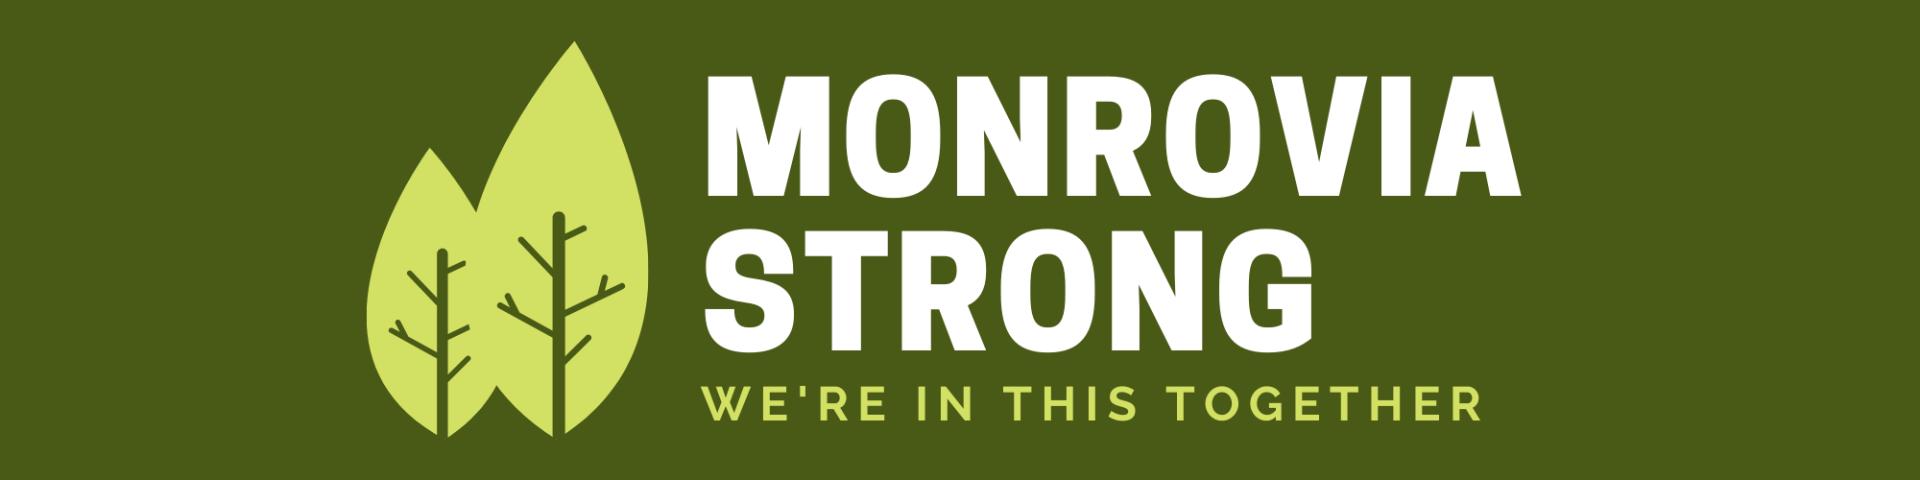 Monrovia Strong banner